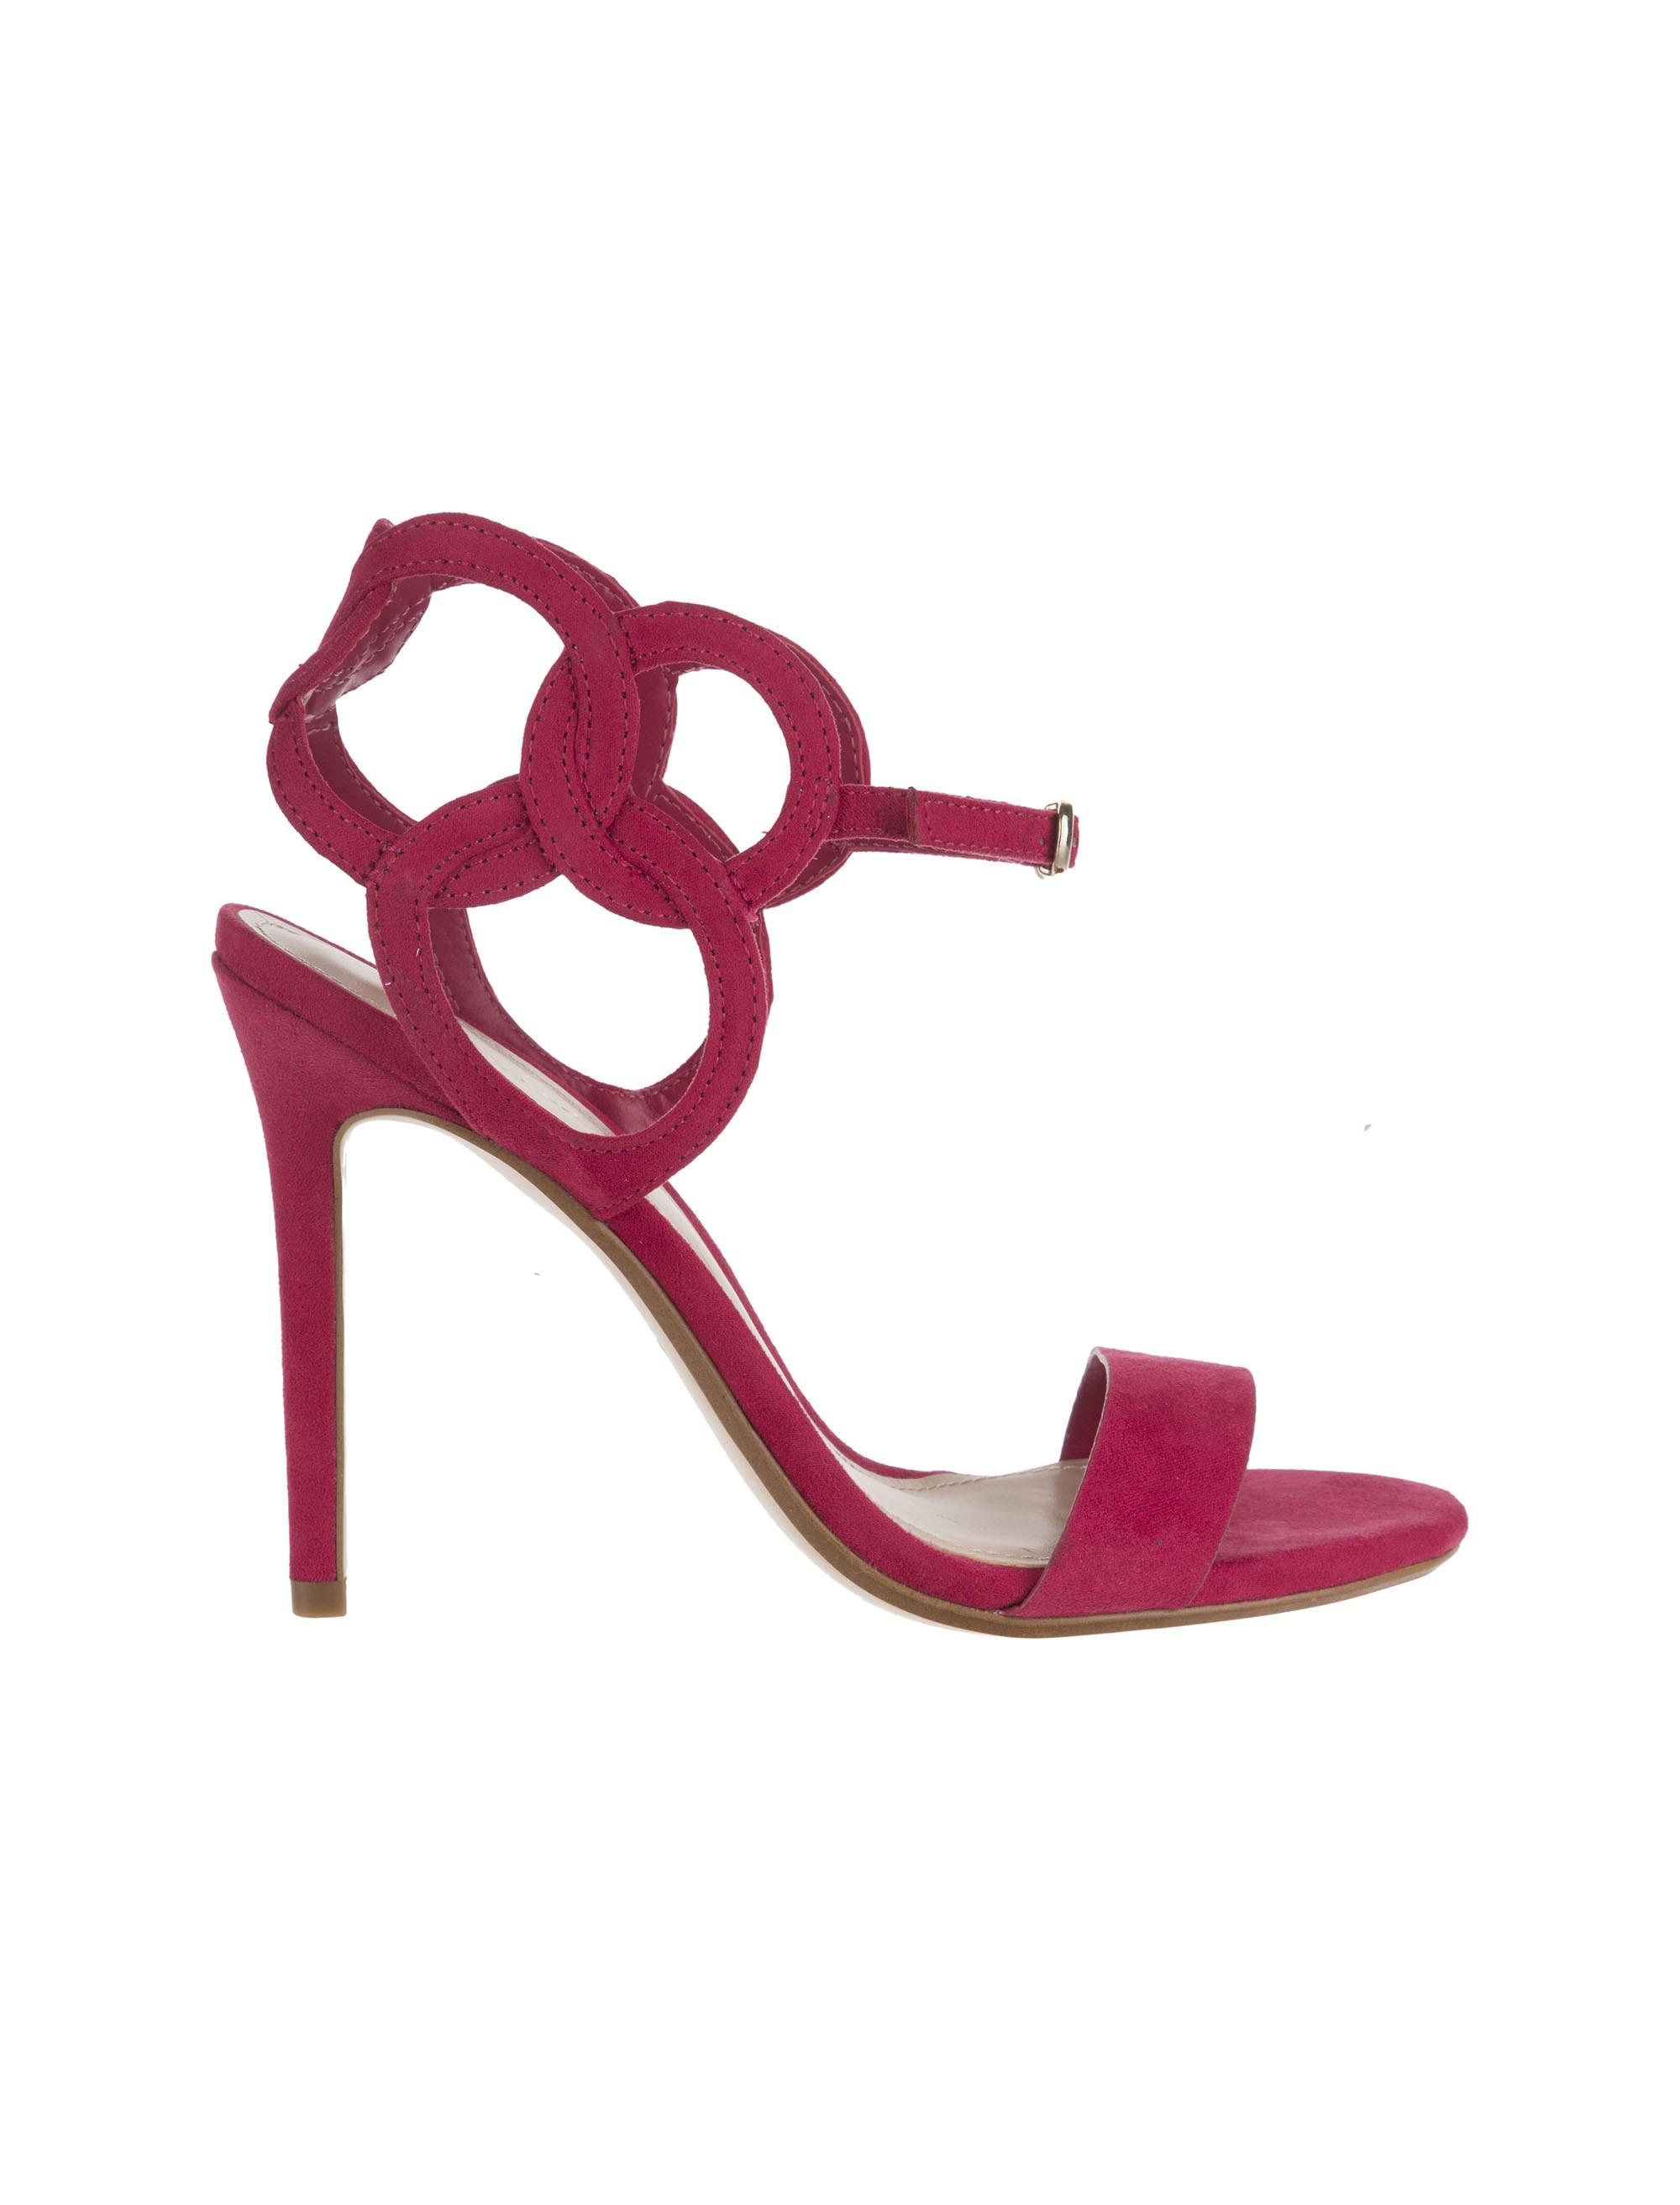 کفش پاشنه بلند زنانه - مانگو